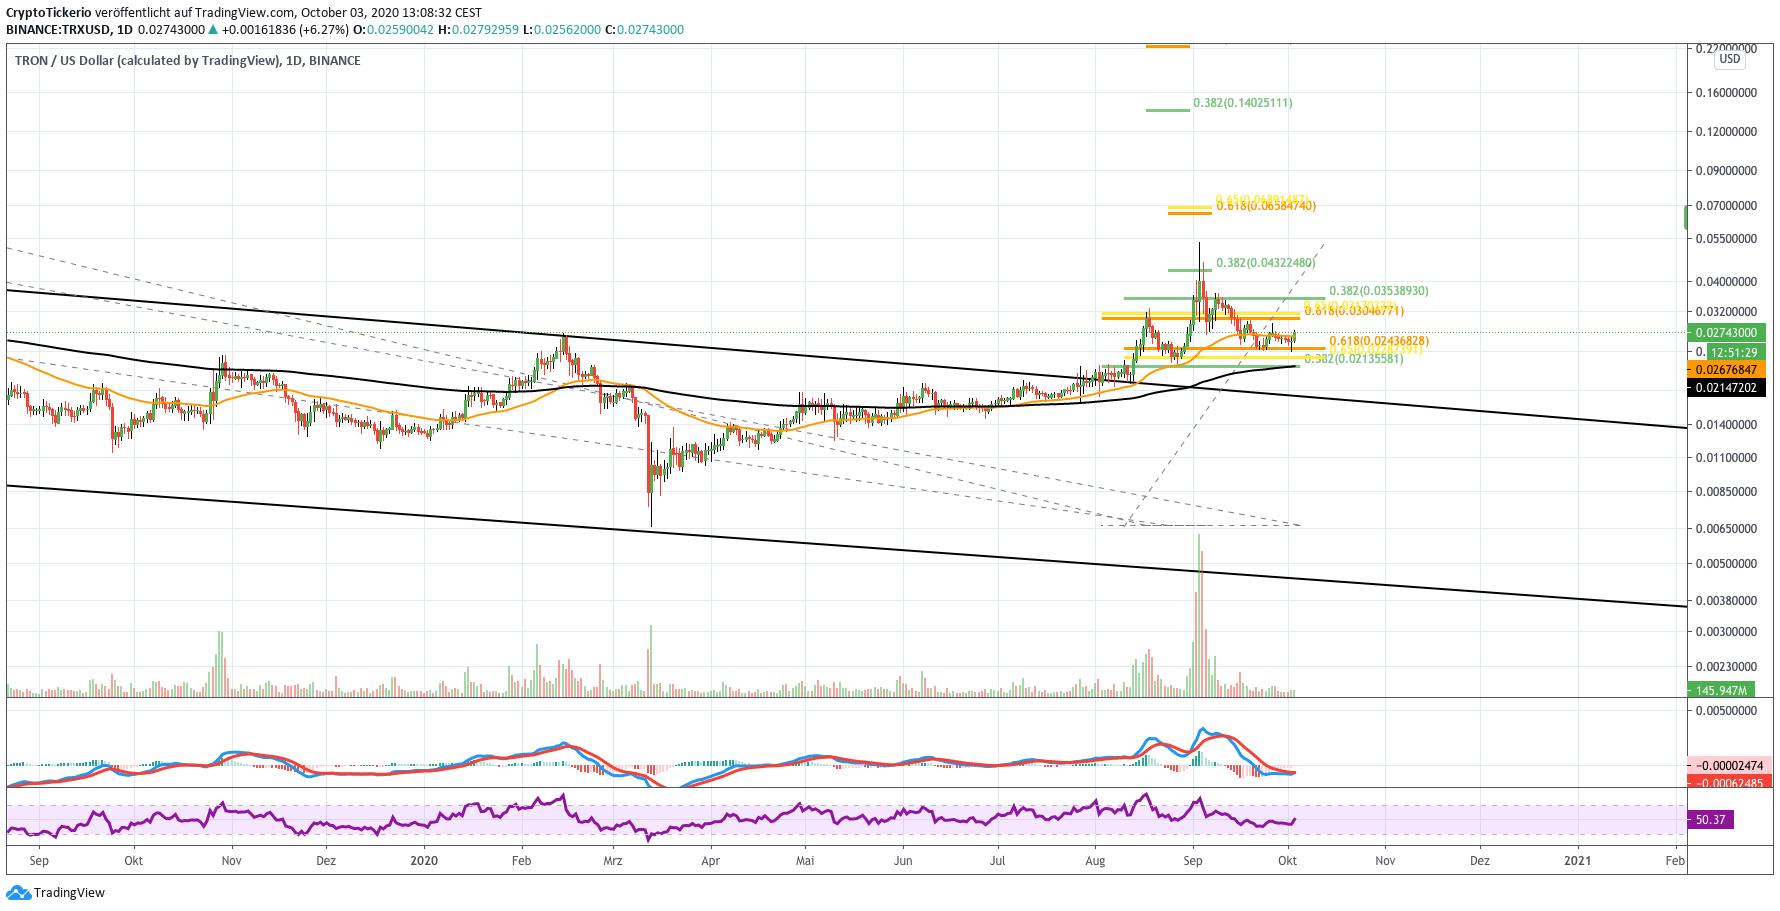 TRX/USD daily price chart analysis